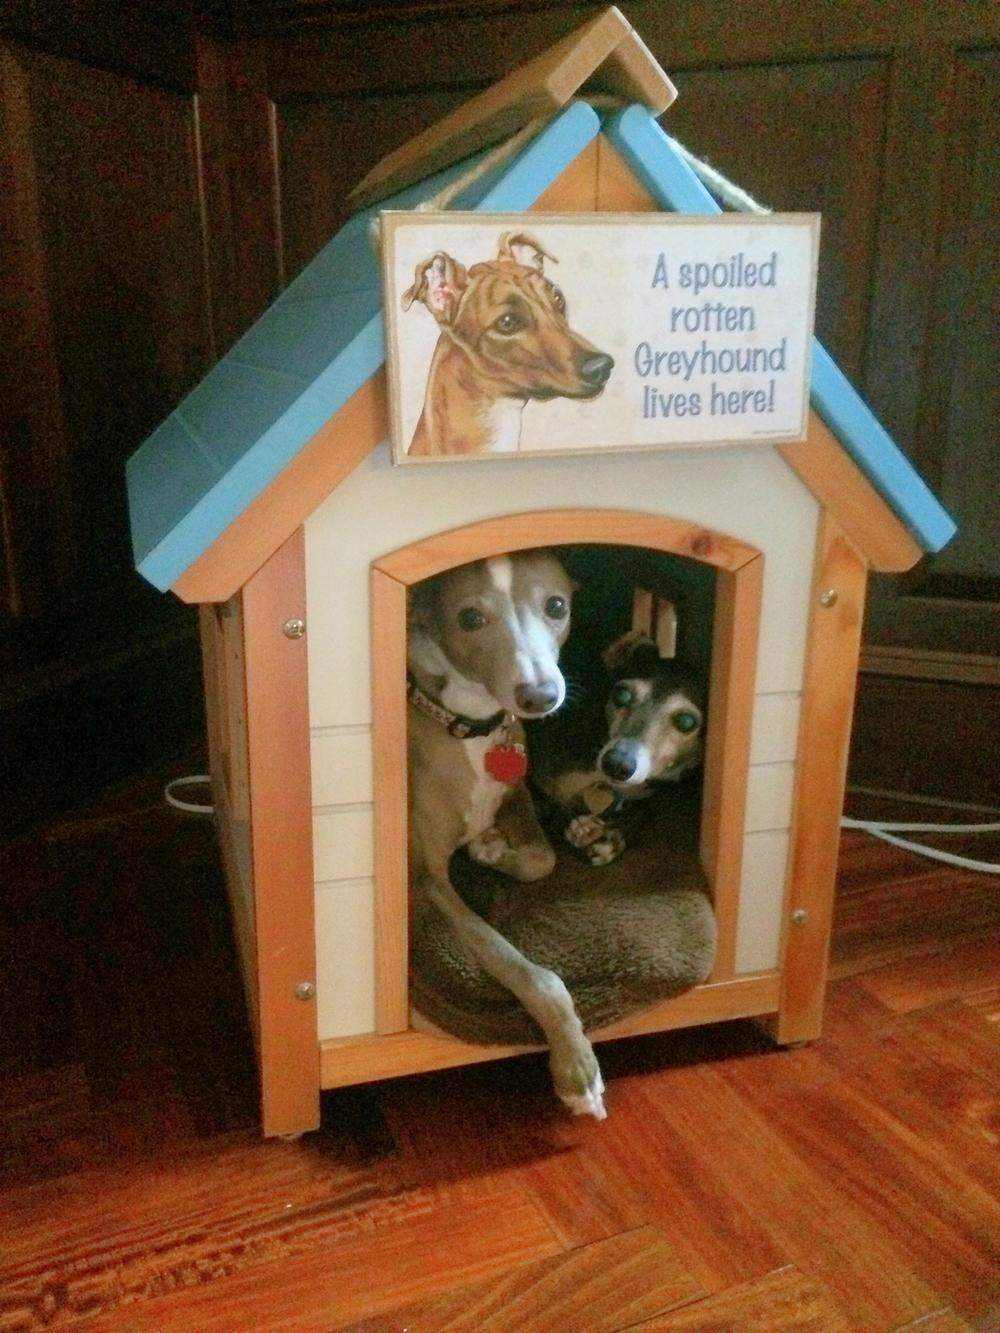 Spoiled Italian Greyhounds